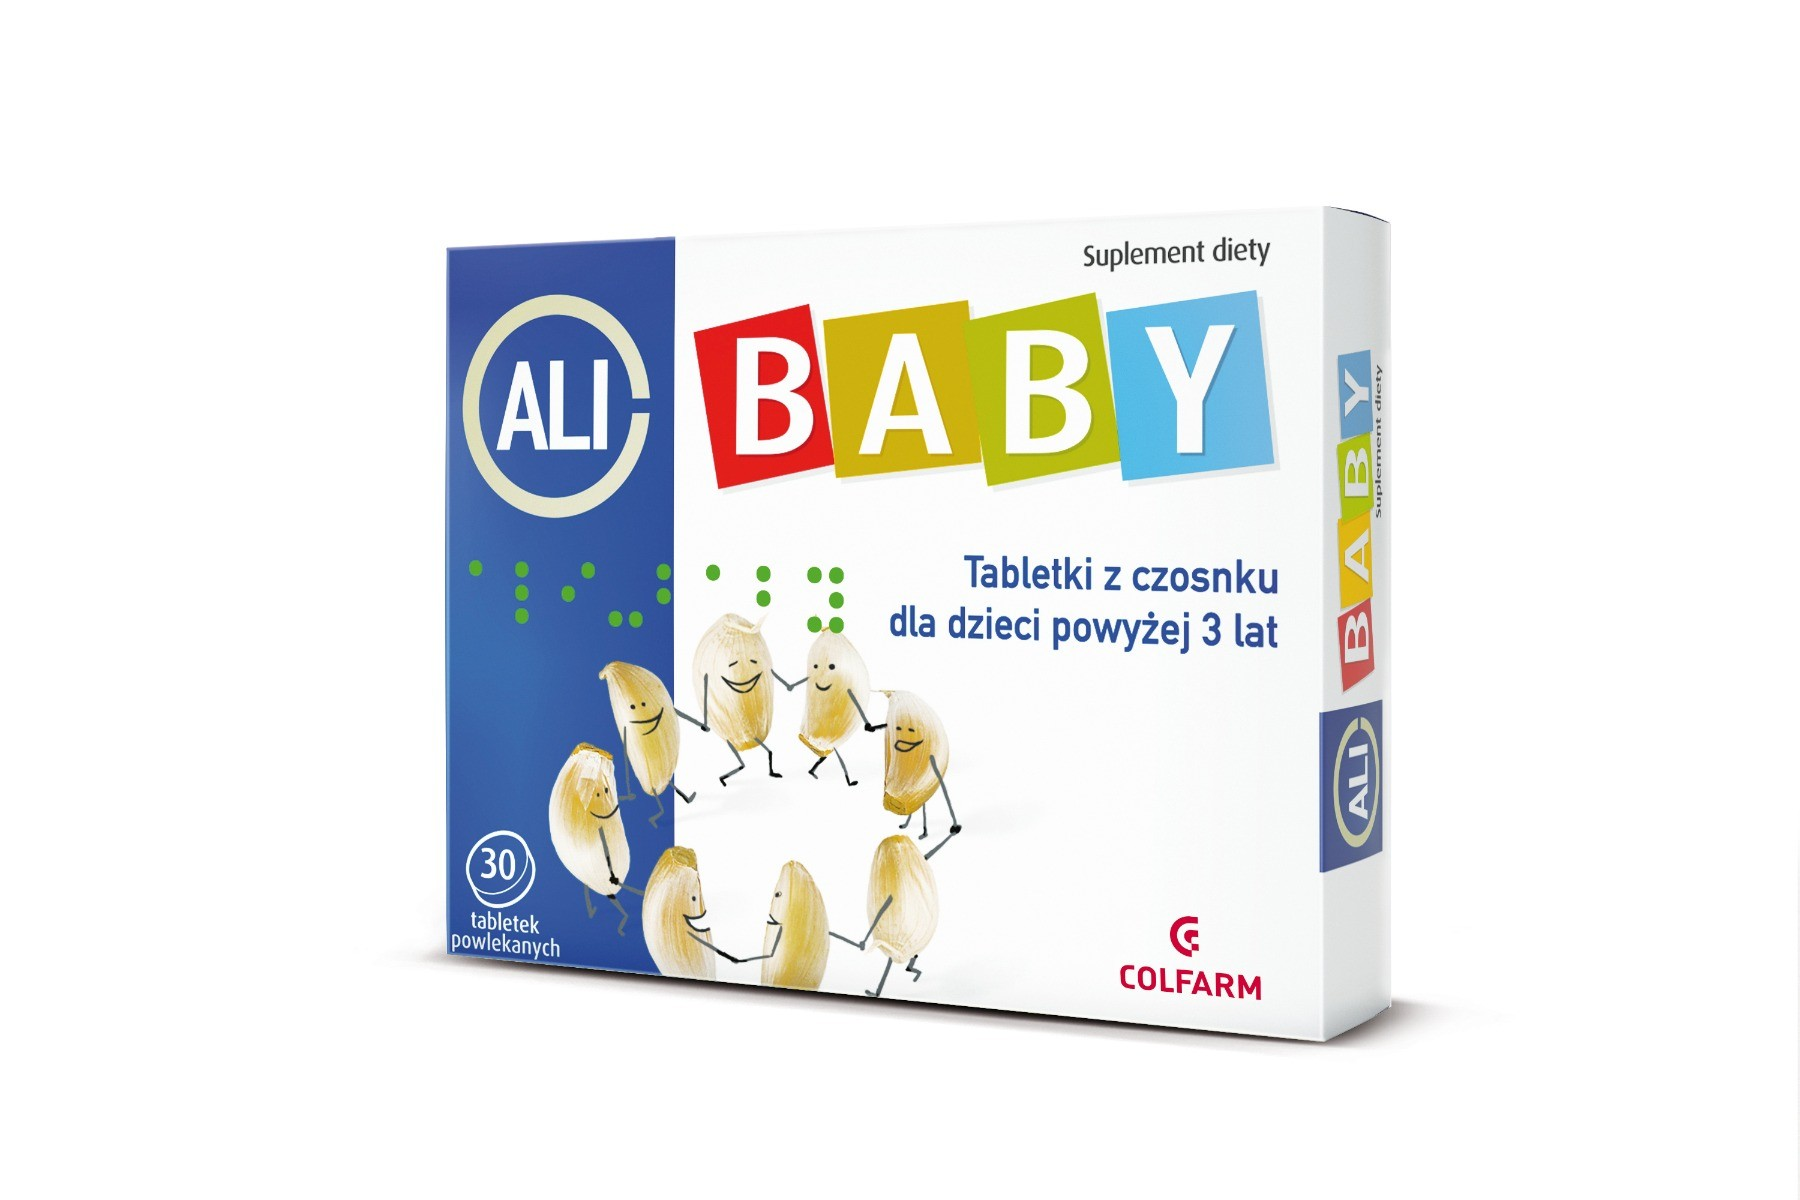 Ali-baby czosnek w tabletkach